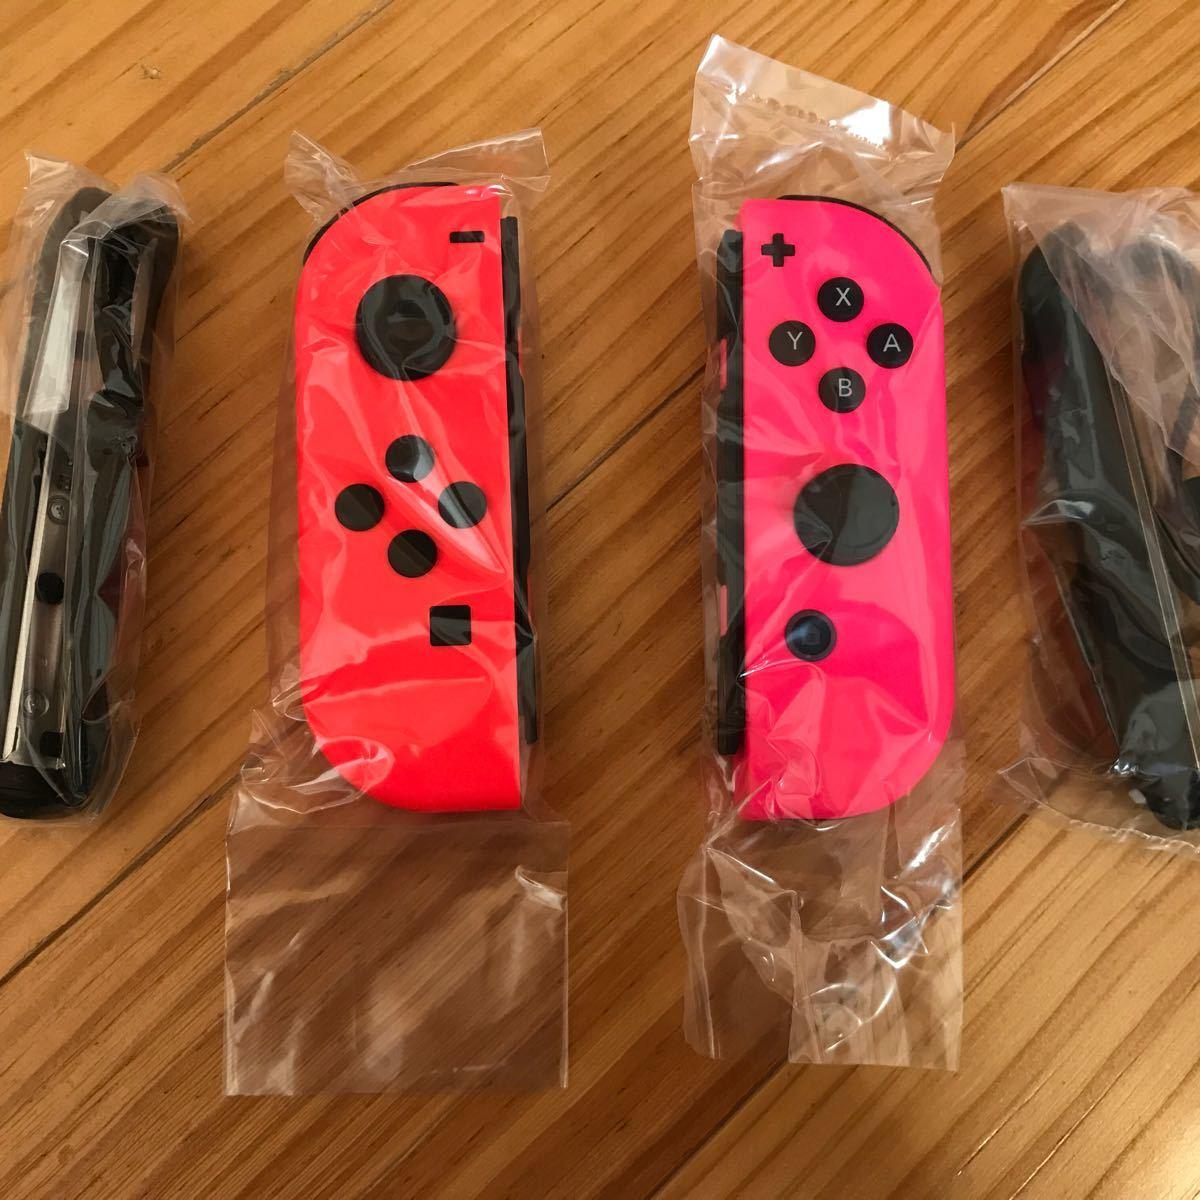 Nintendo Switch ネオンレッド &ネオンピンク